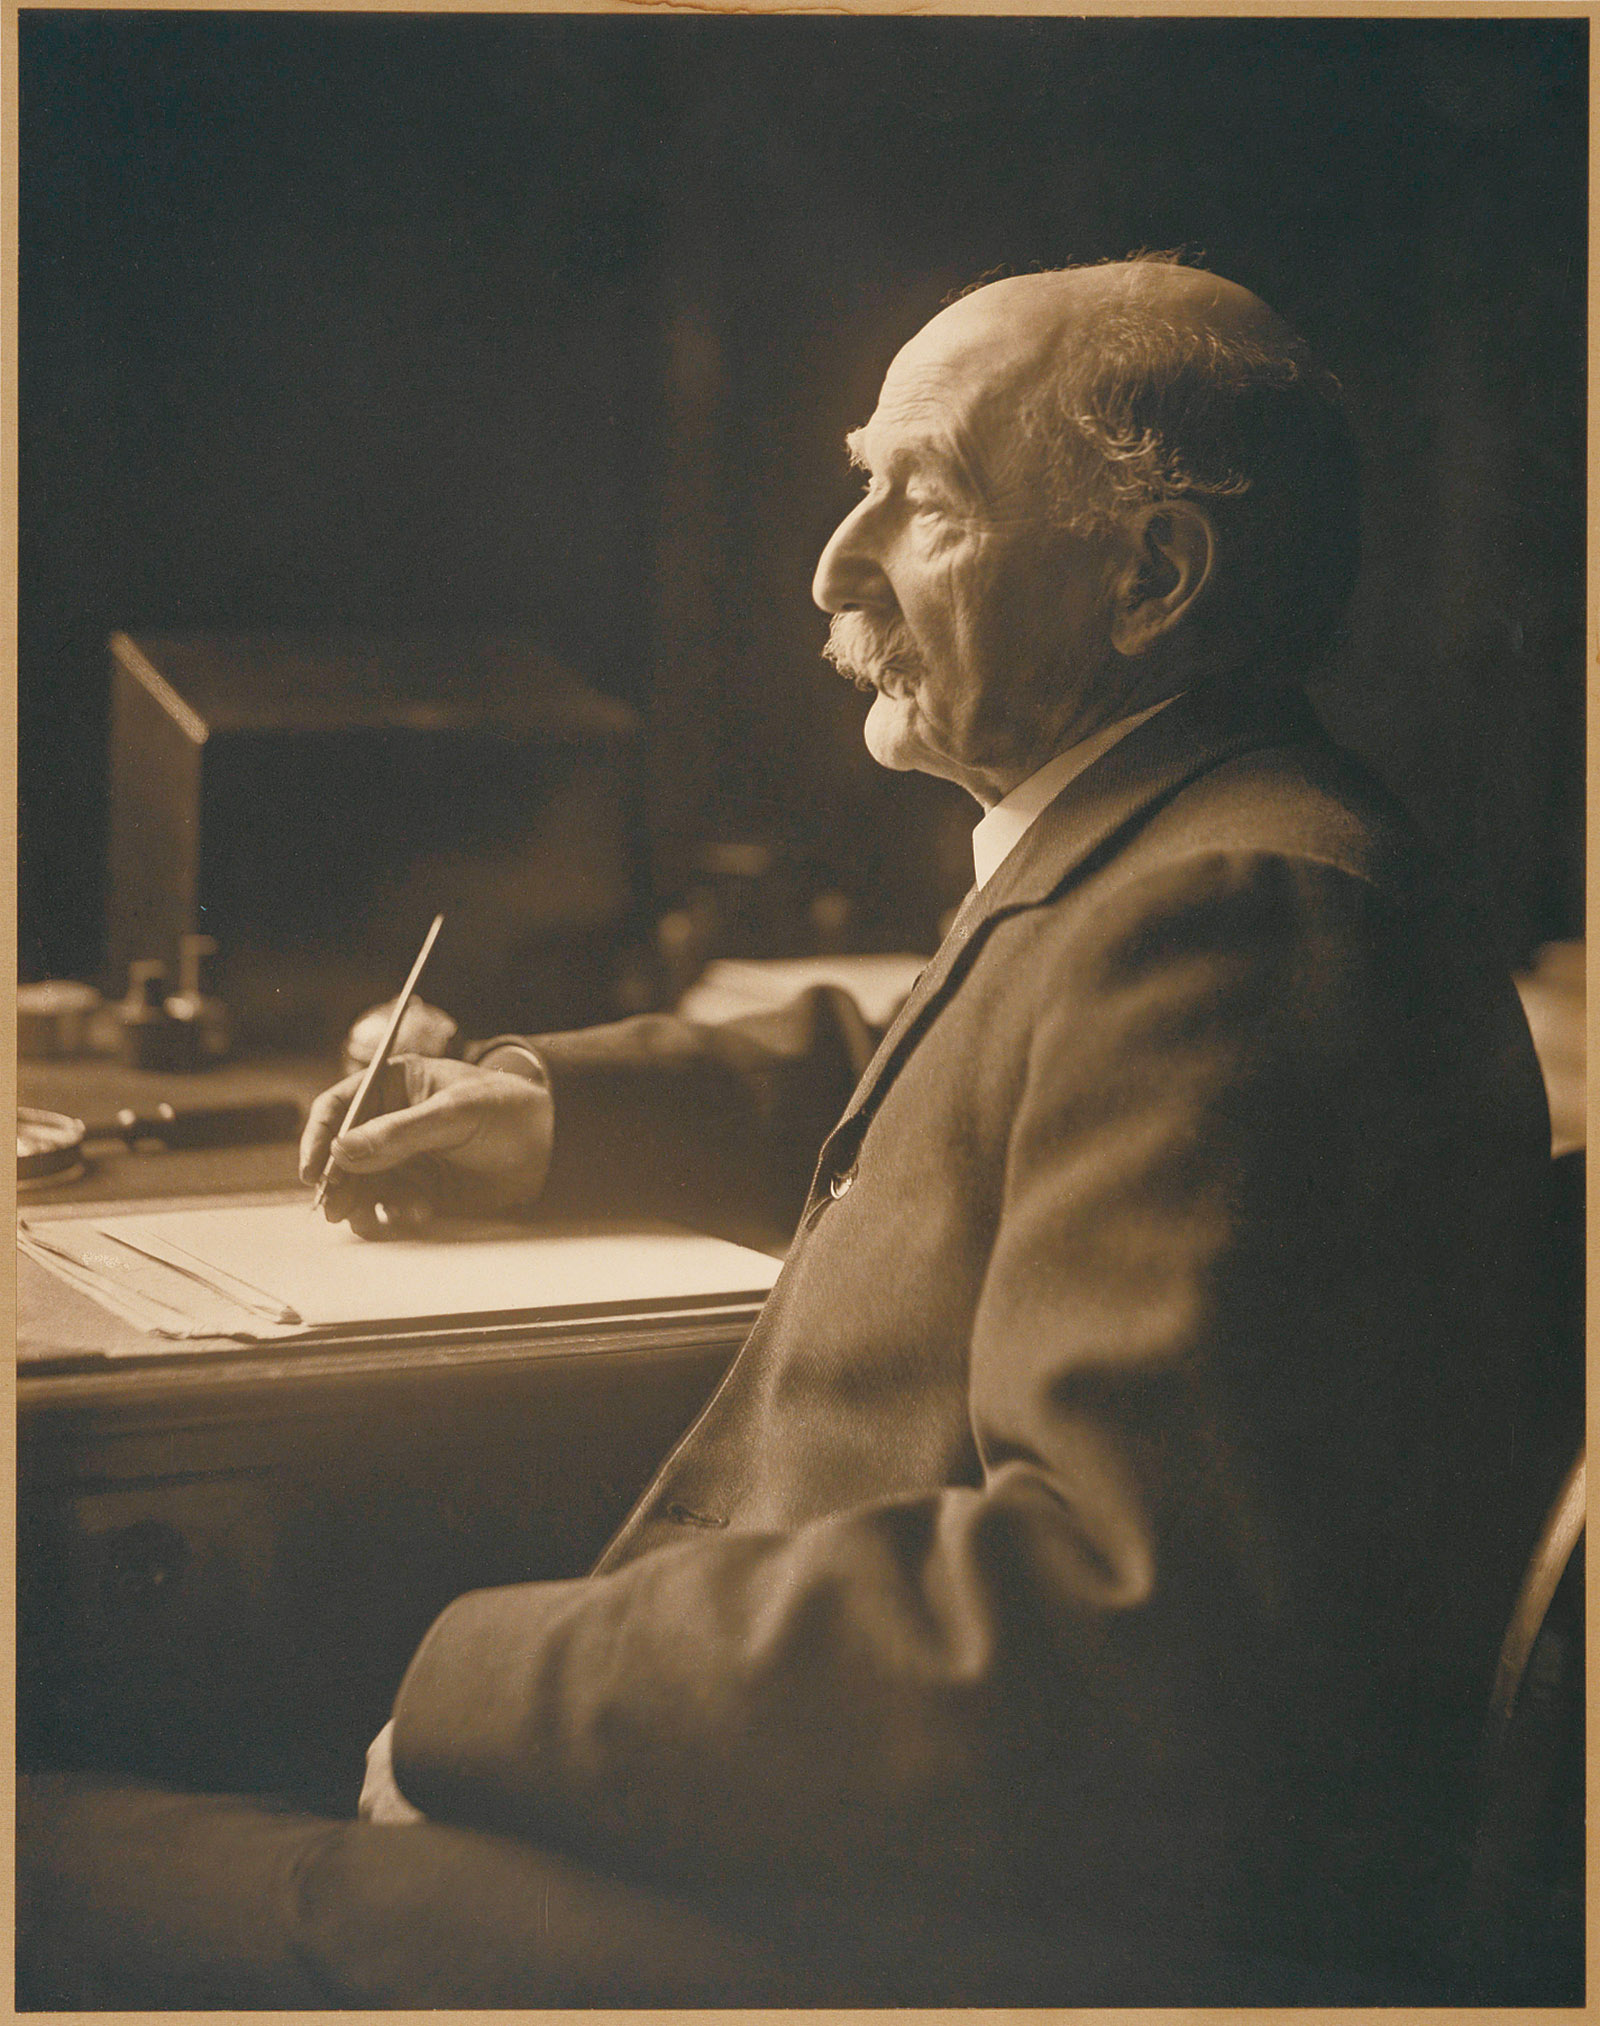 Thomas Hardy, 1913; photograph by Olive Edis